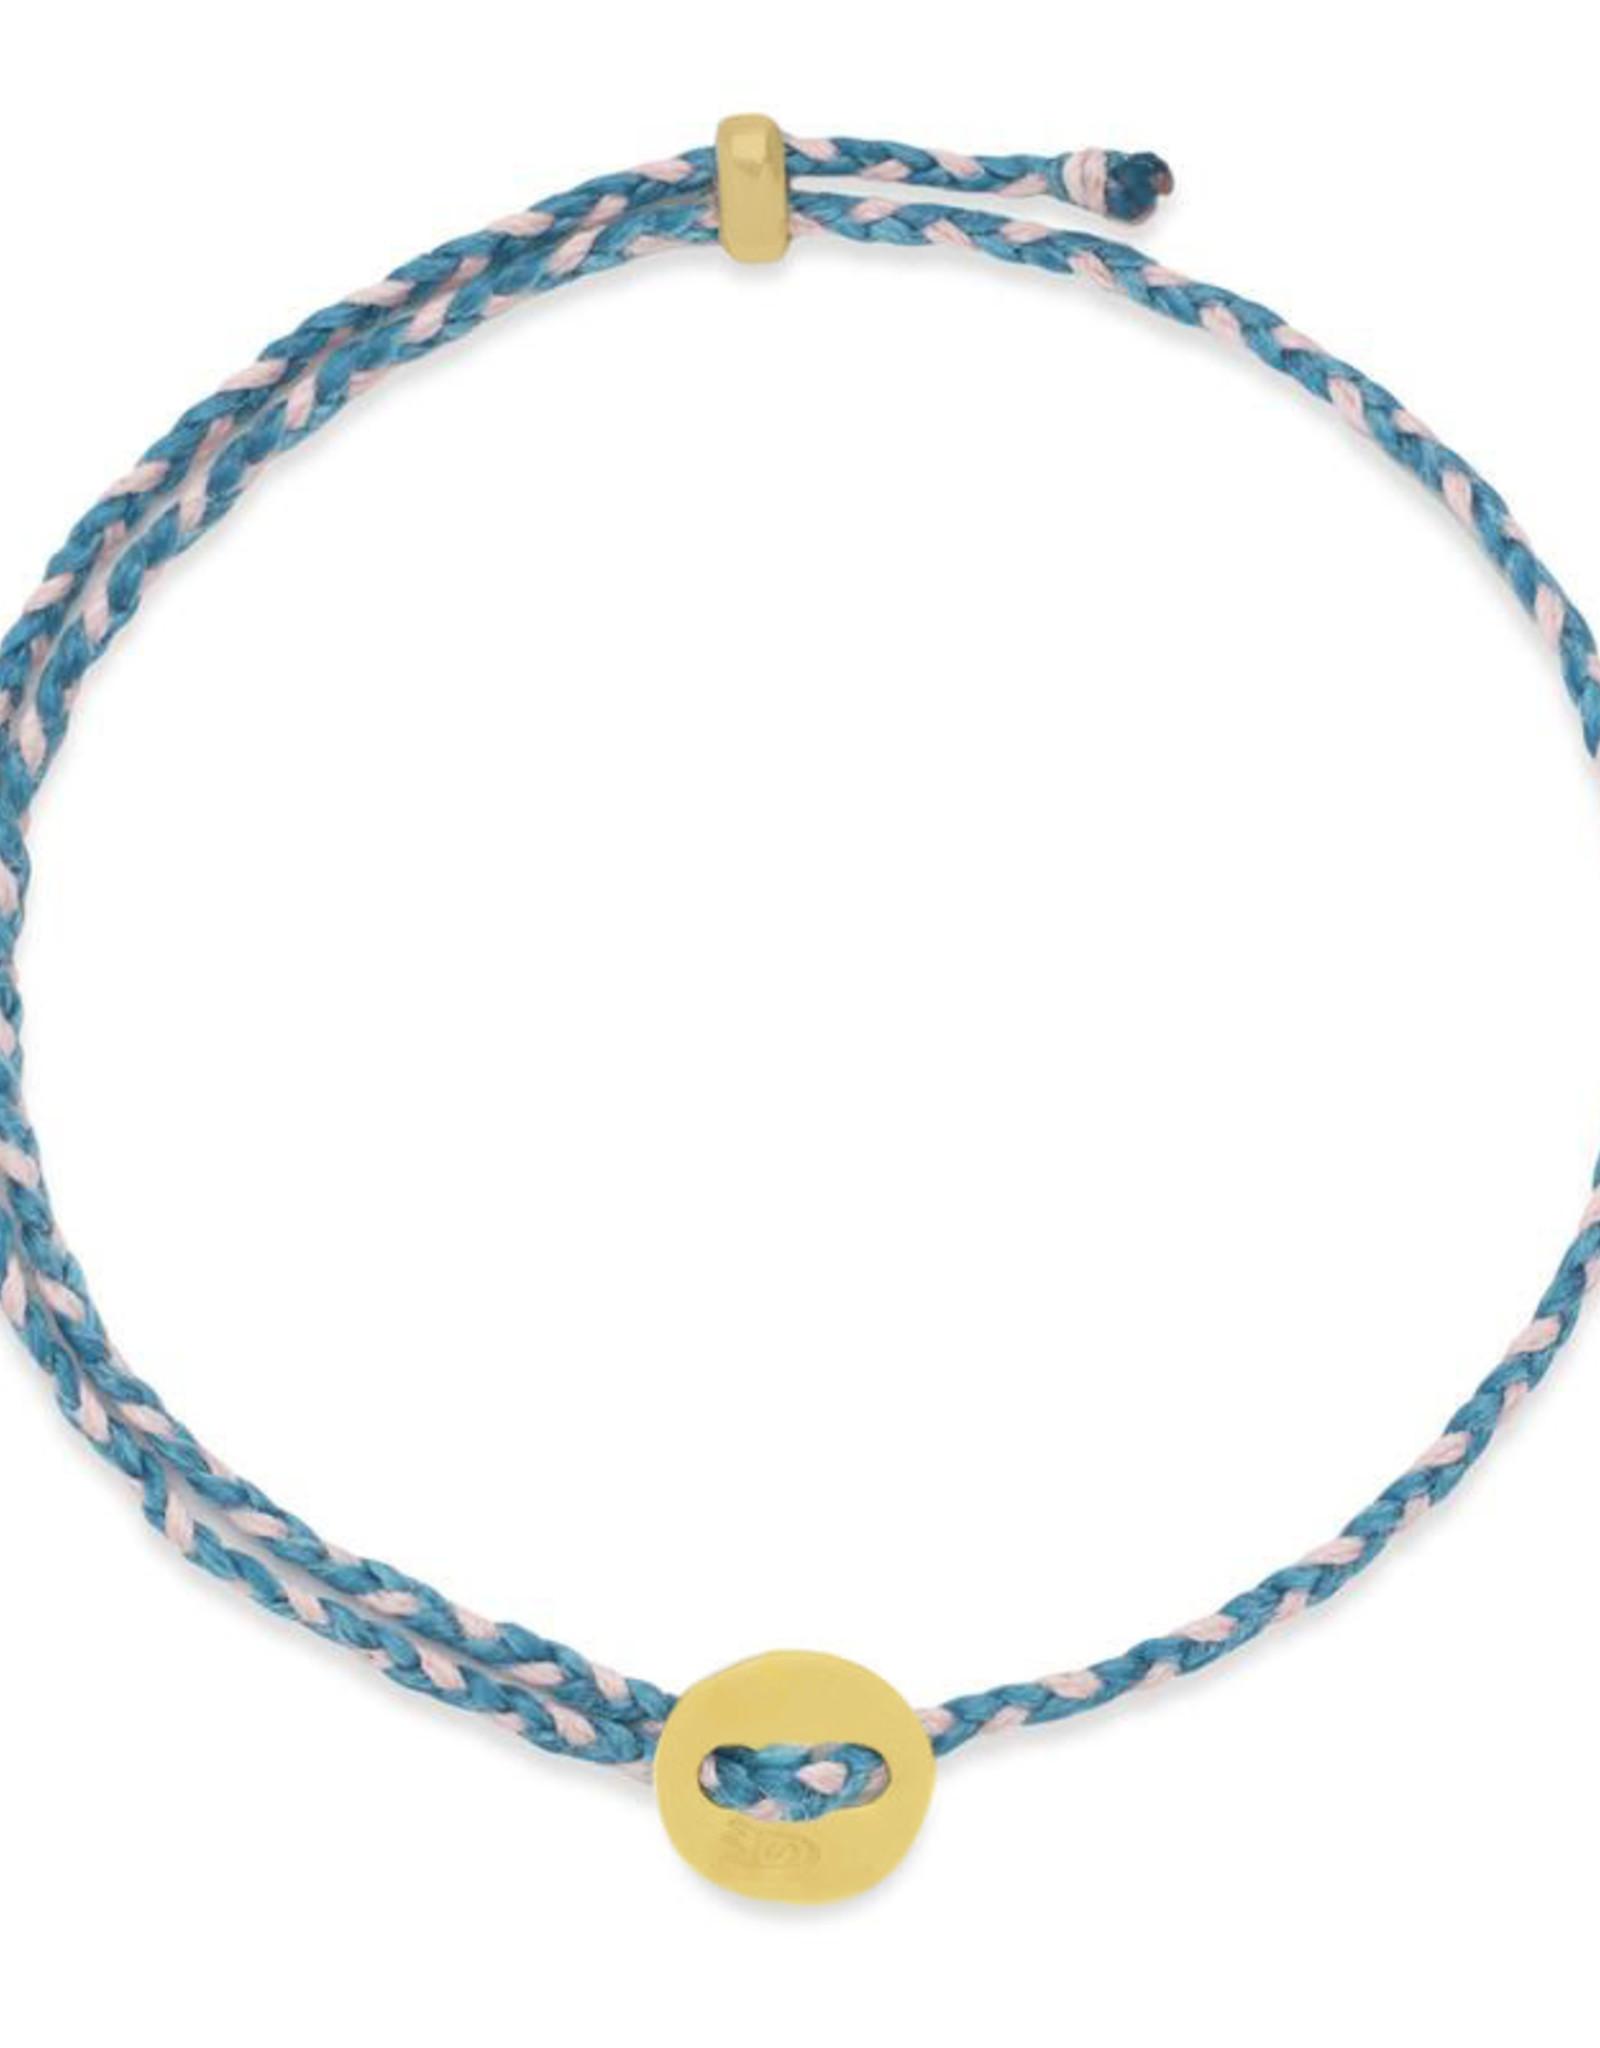 Scosha Signature Brass Slider Bracelet - Turquoise + Light Pink